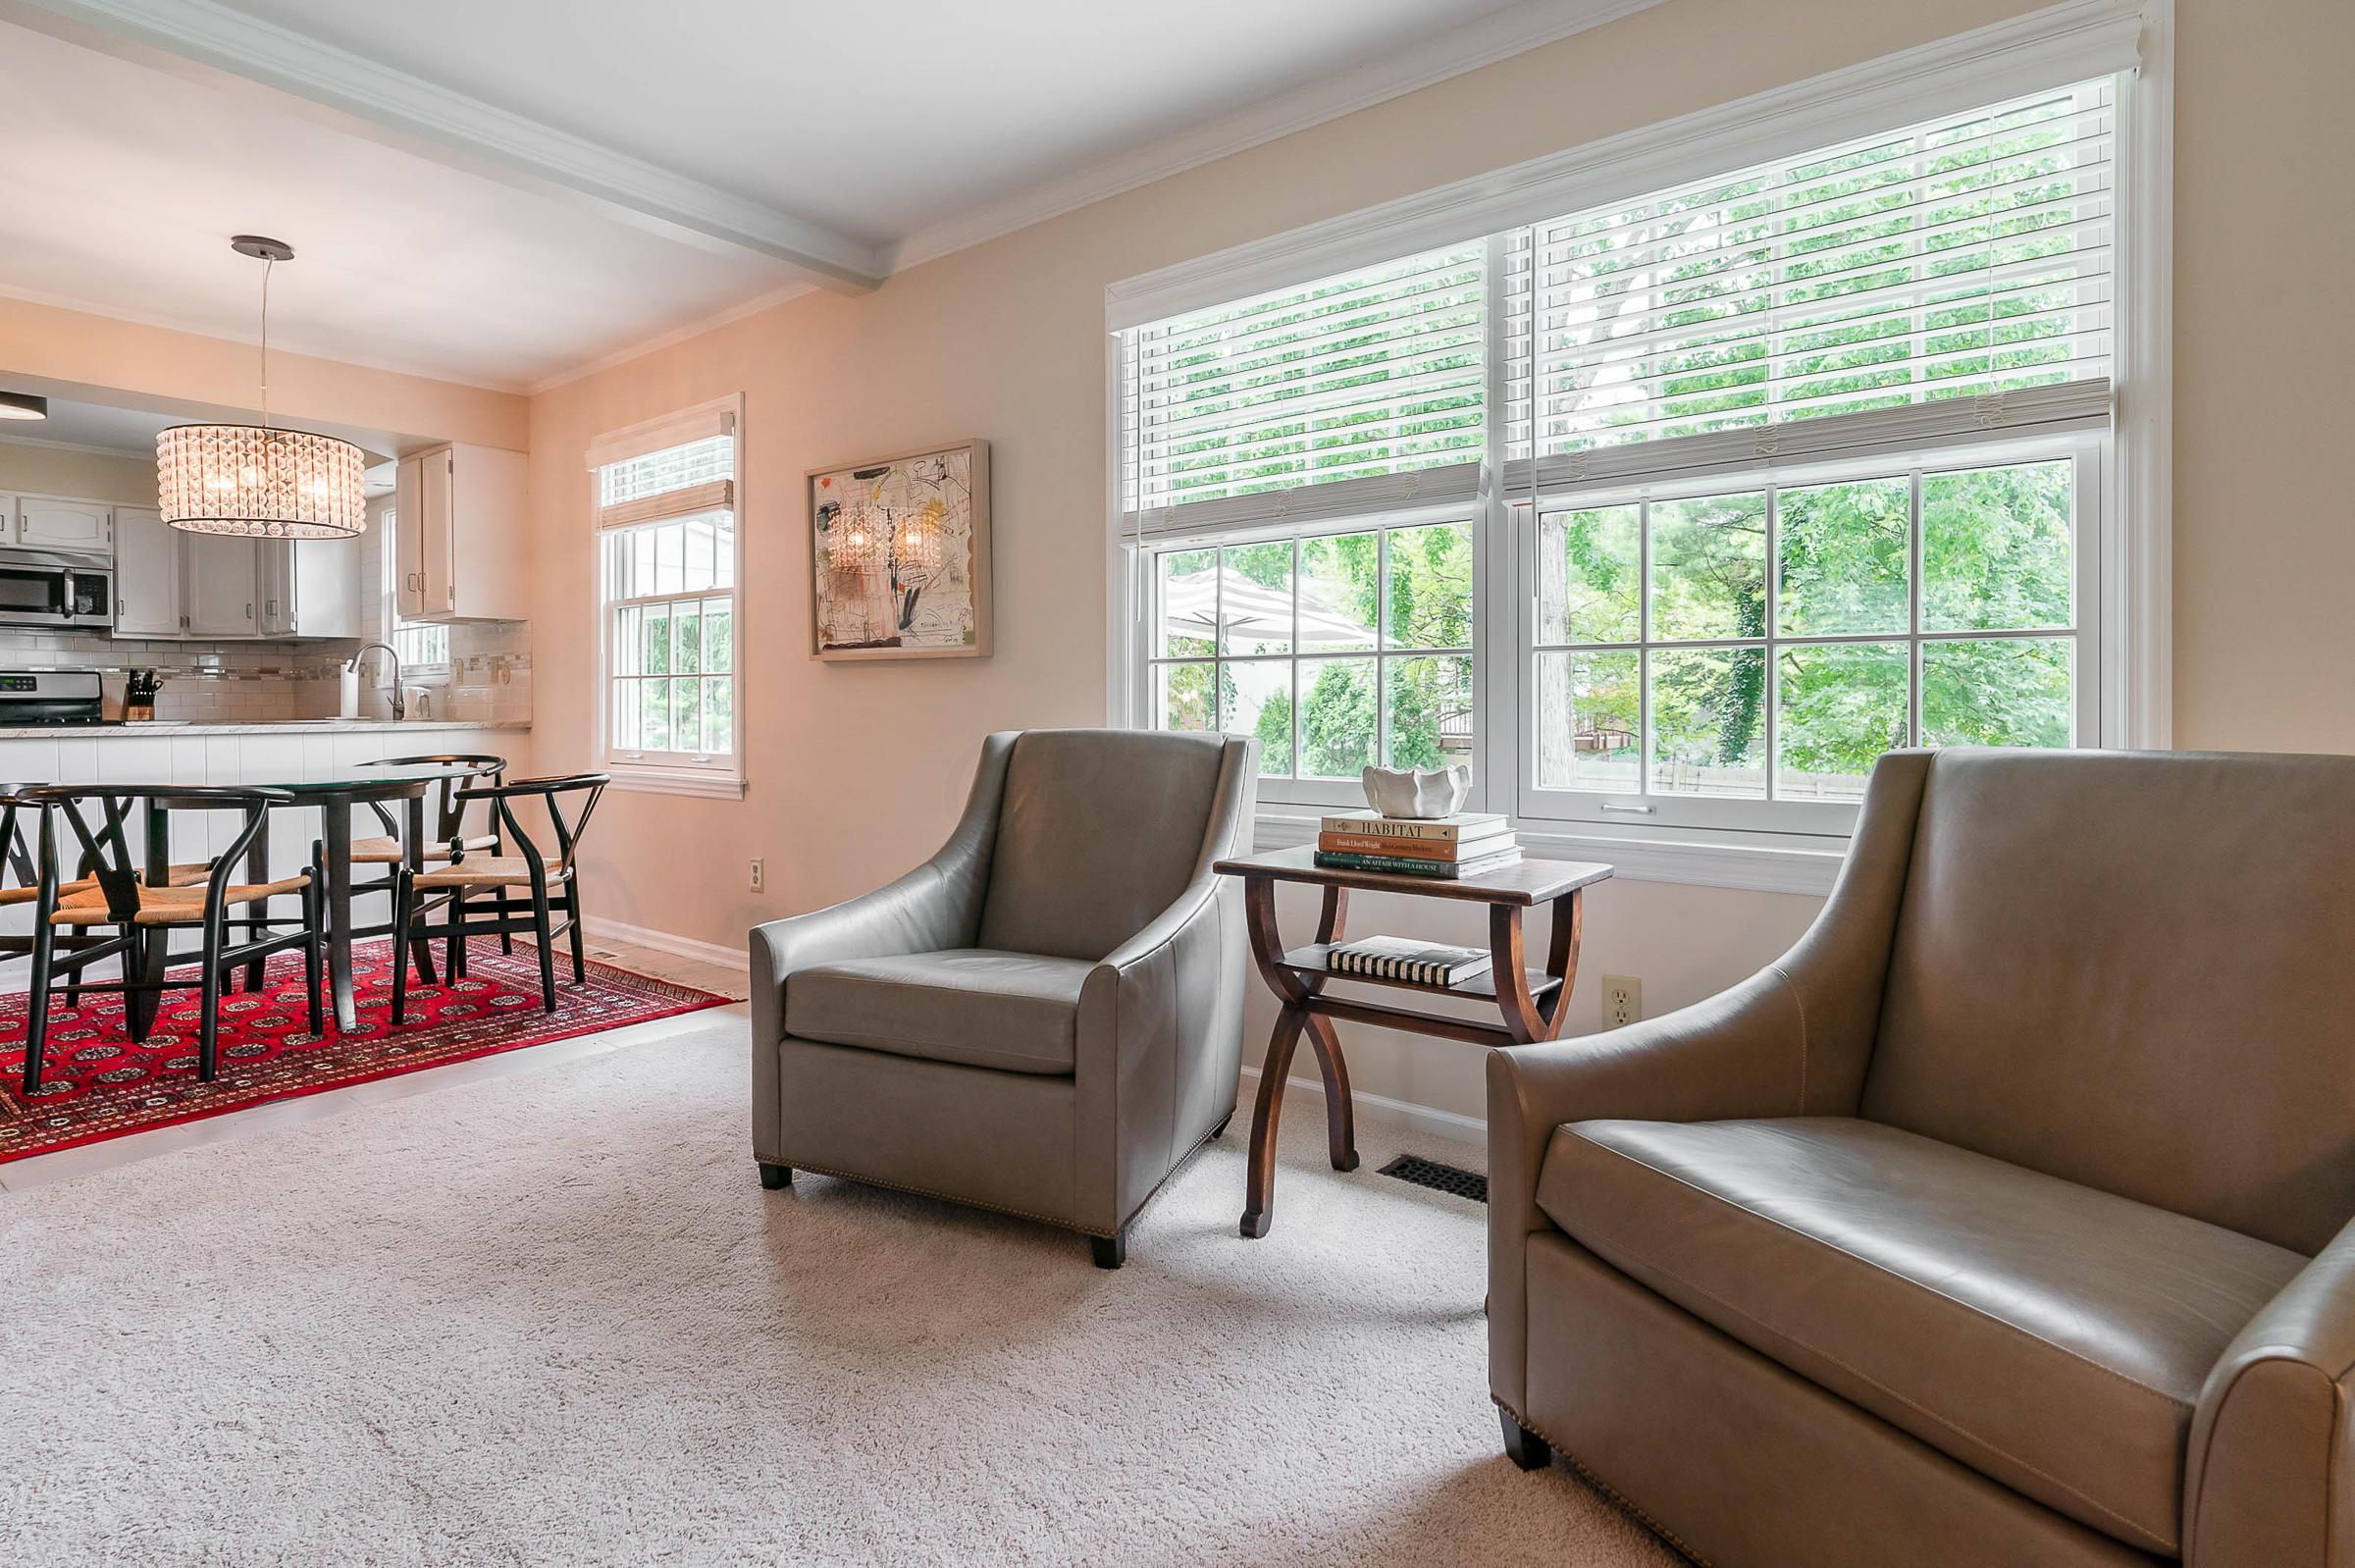 4585 Gateway Drive, Upper Arlington, Ohio 43220, 4 Bedrooms Bedrooms, ,3 BathroomsBathrooms,Residential,For Sale,Gateway,220031924